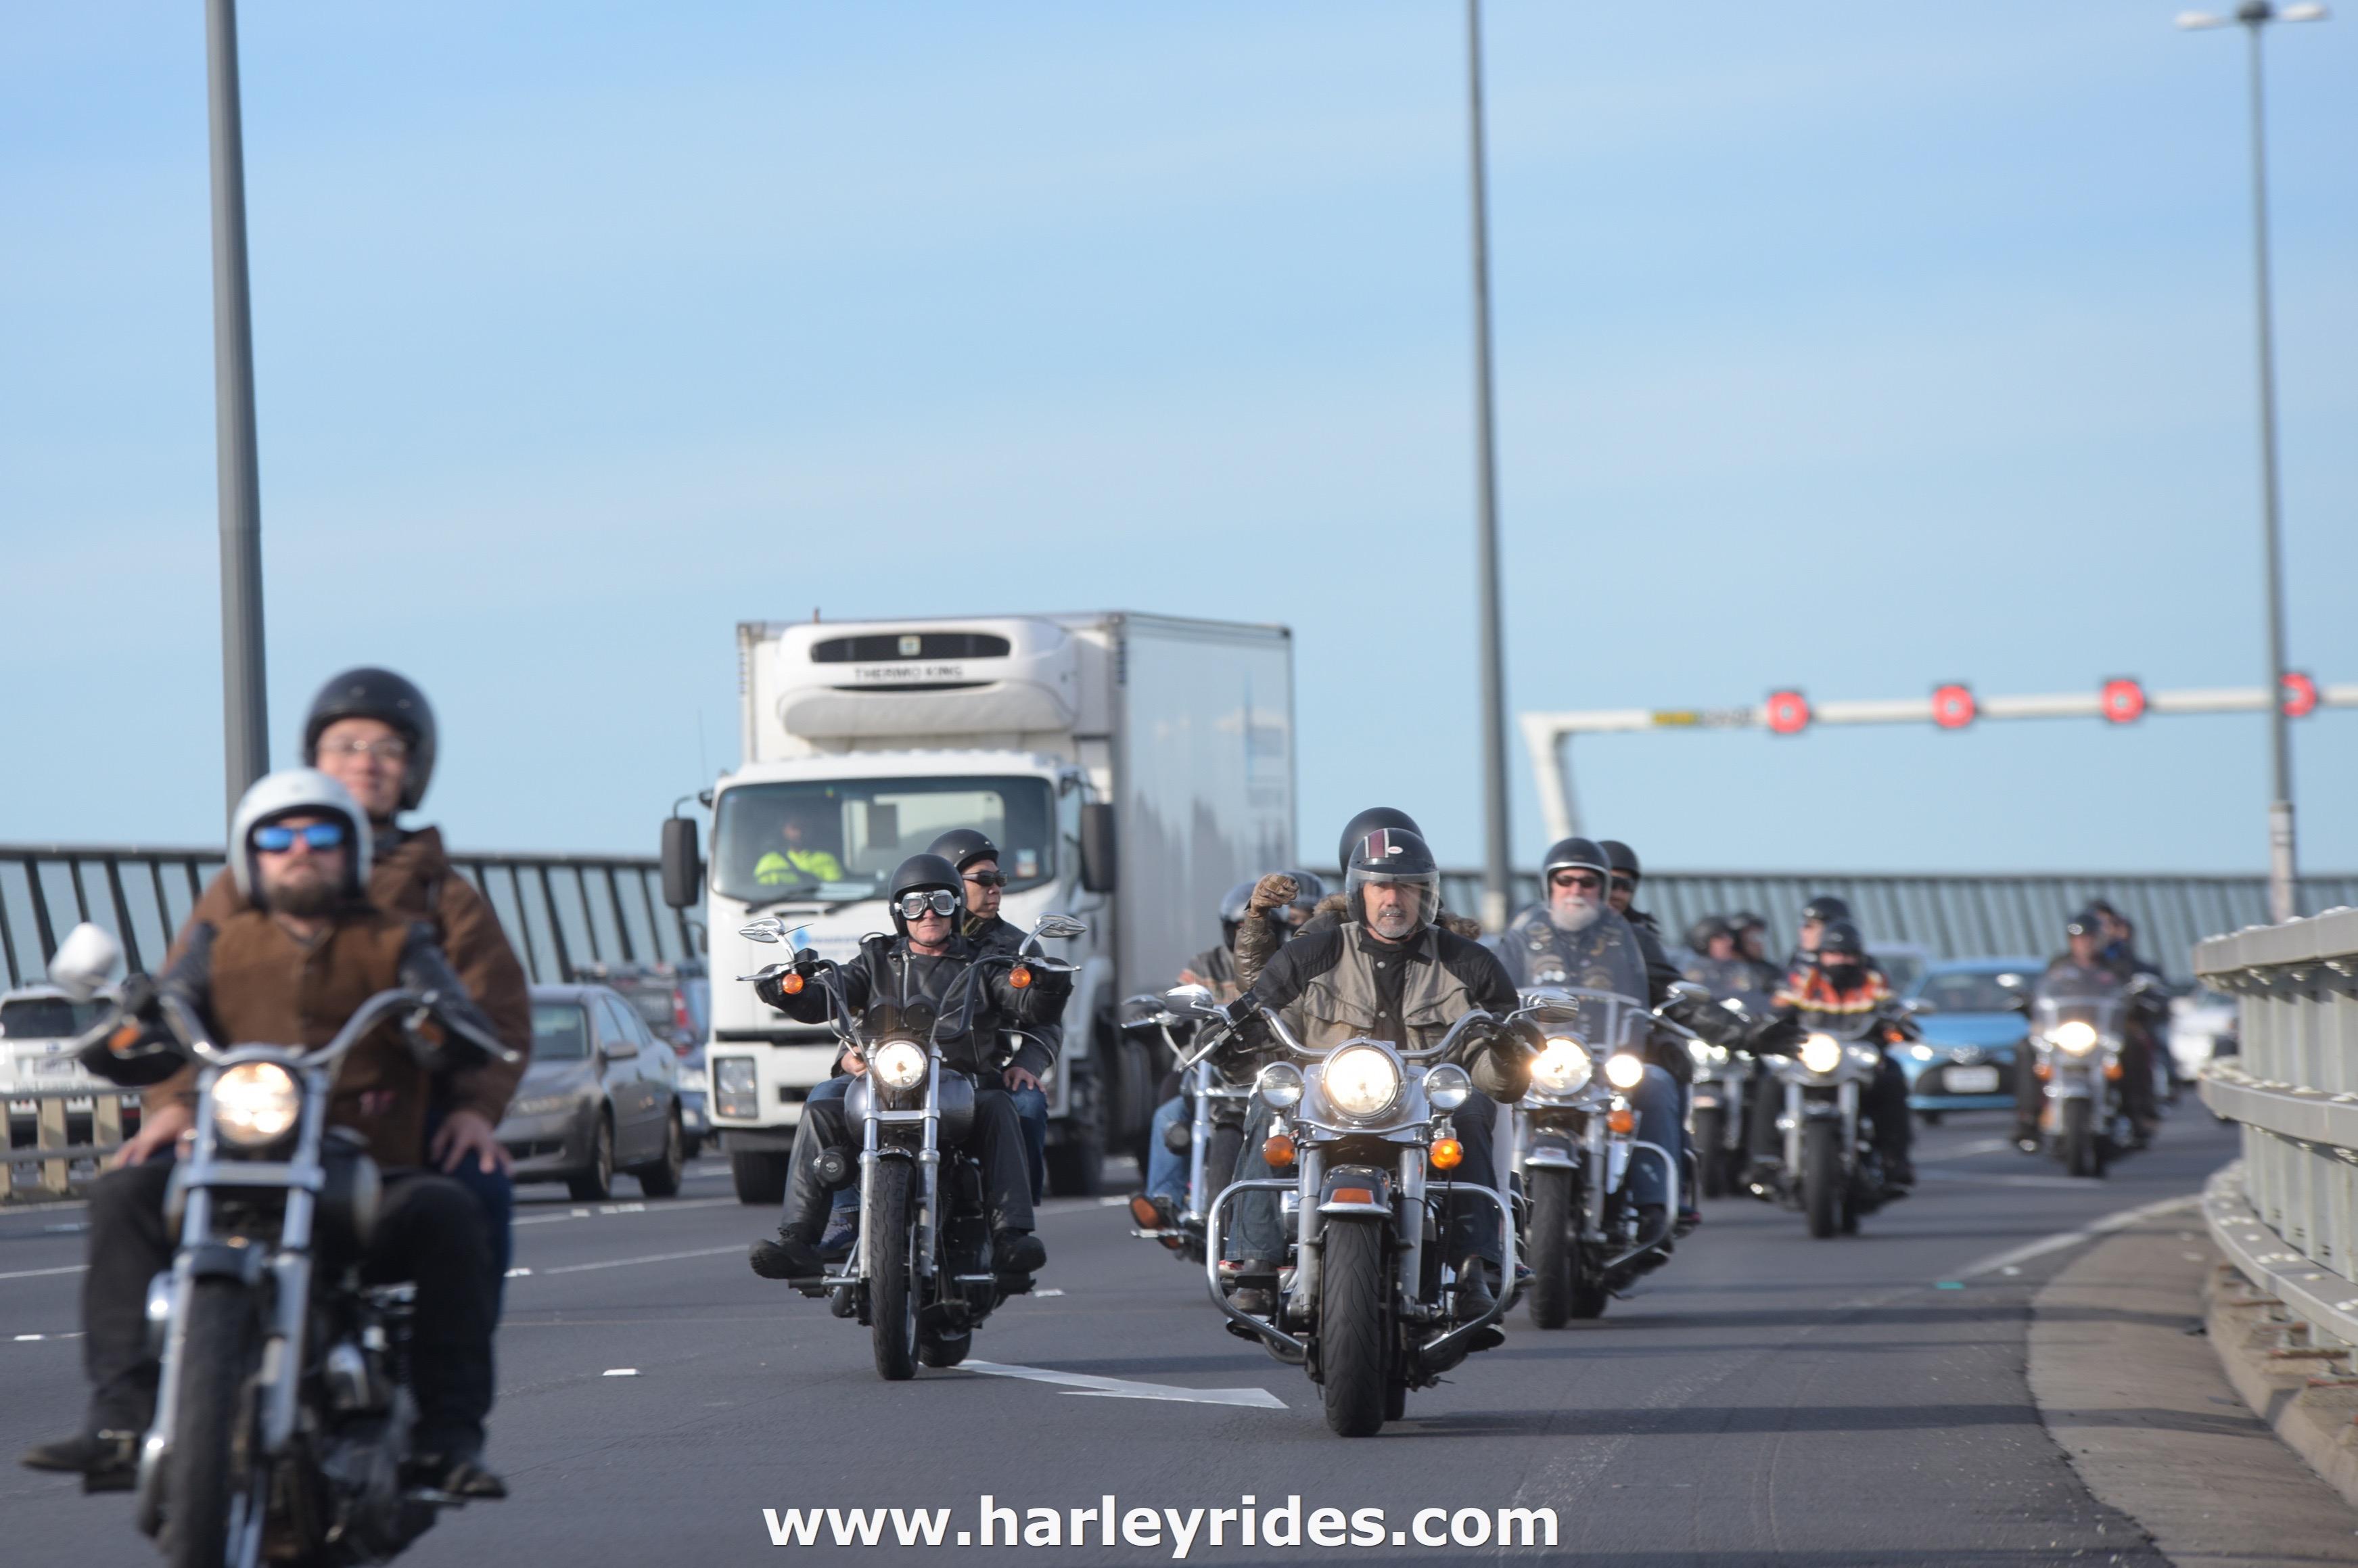 HarleyDavidsonGroupRide (39).jpg